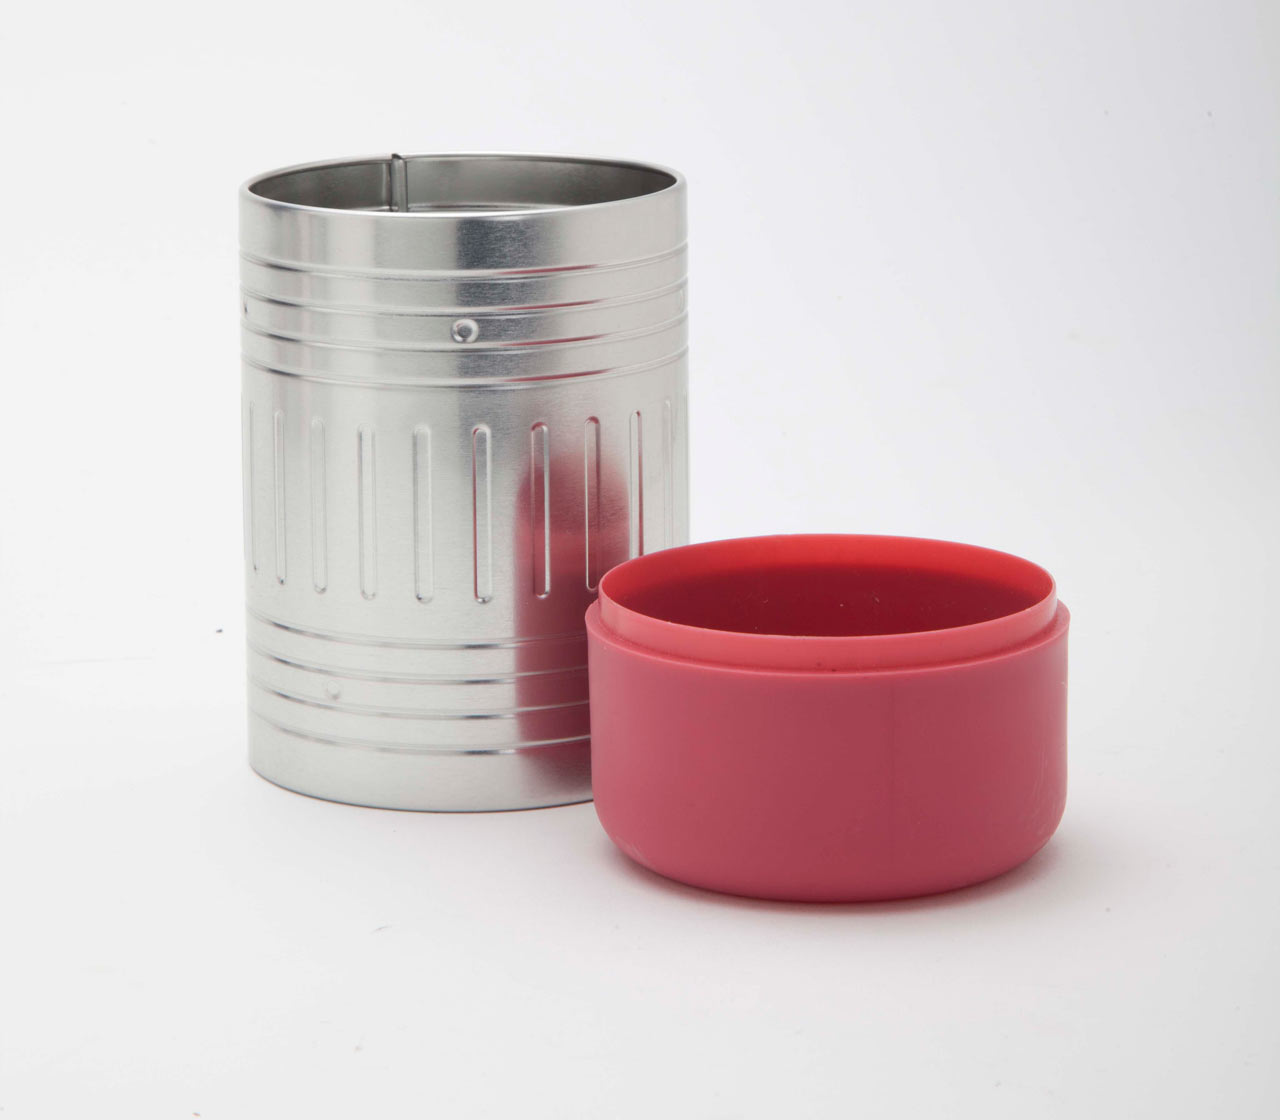 Artori-Design-9-Pencil-Cup-pink